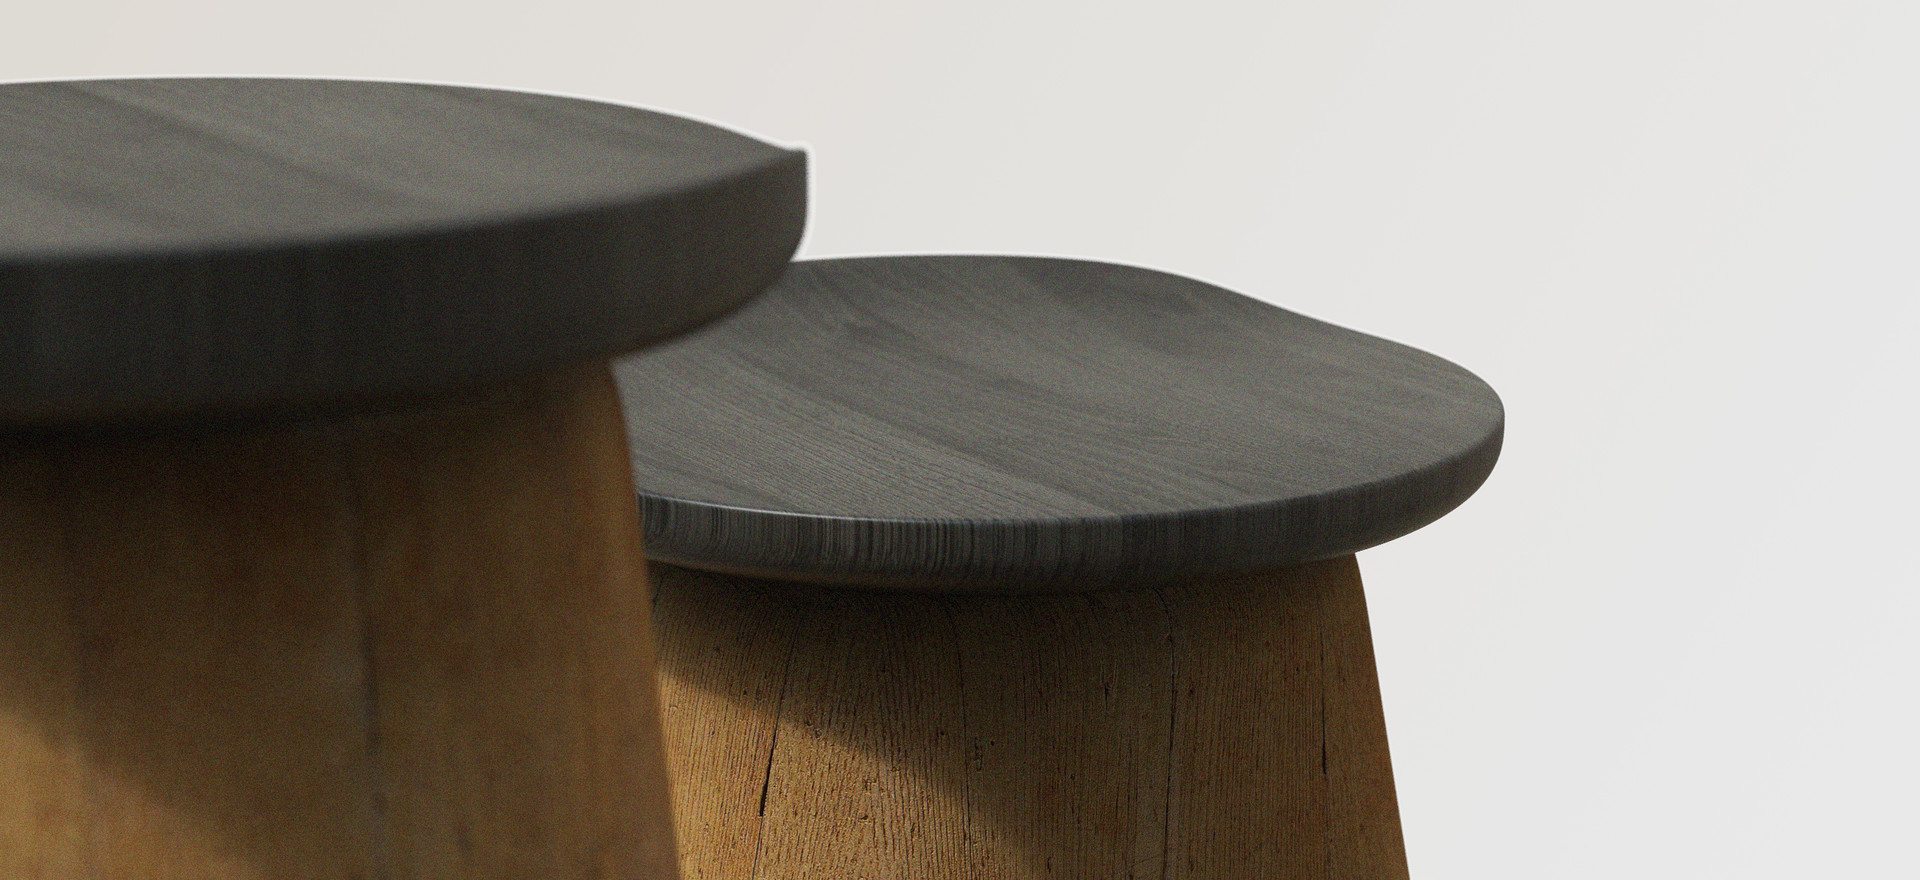 Stool Design - Massif